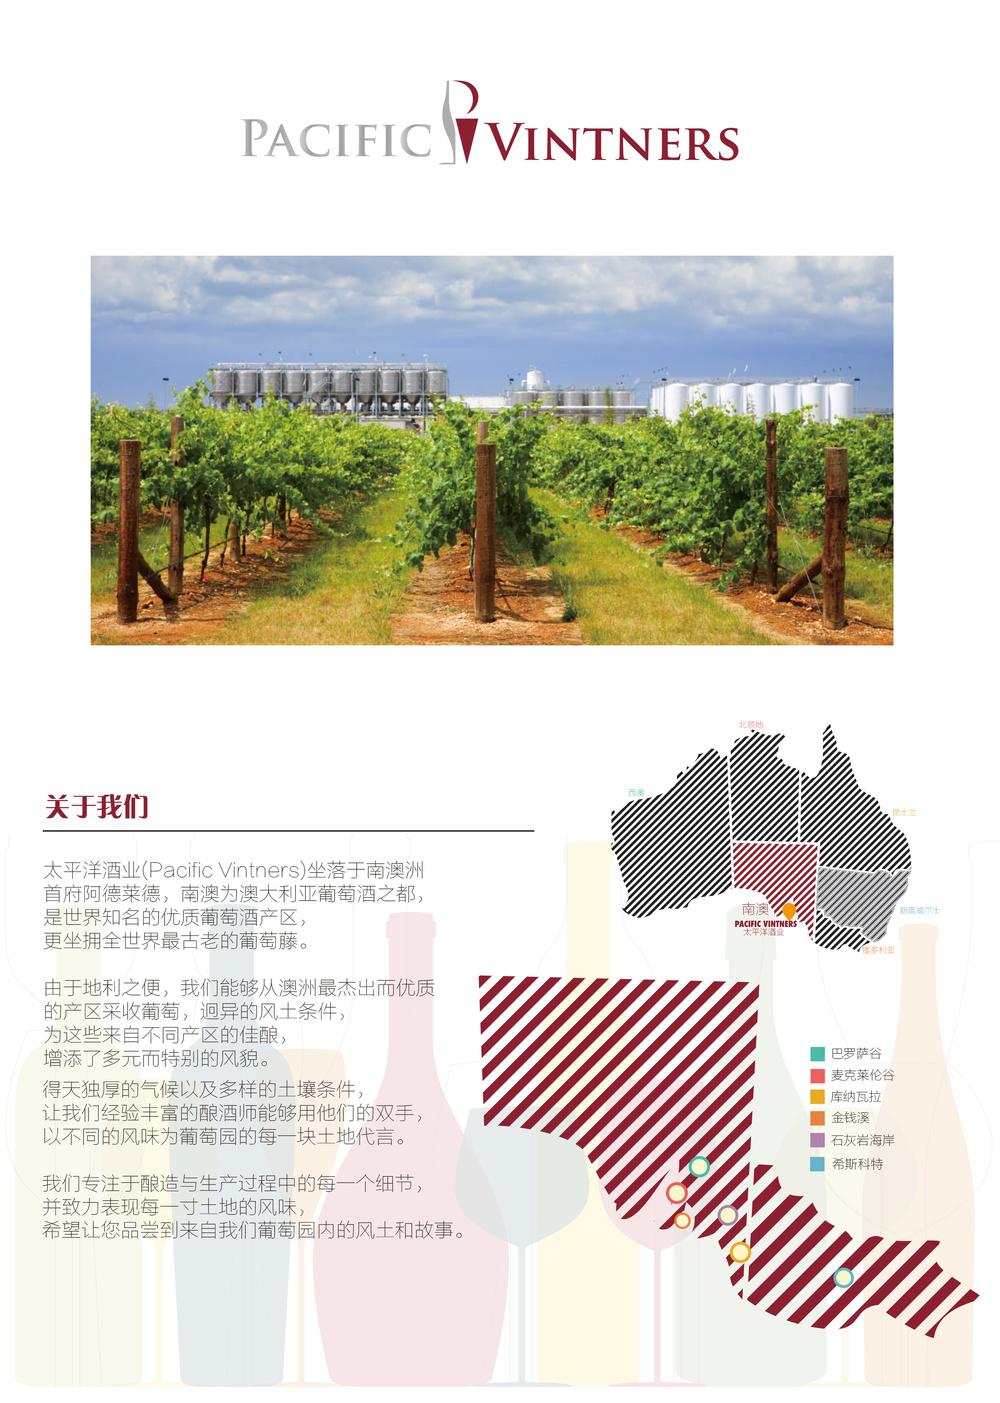 Pacific Vintners 澳大利亚太平洋酒业 公司简介-1.jpg